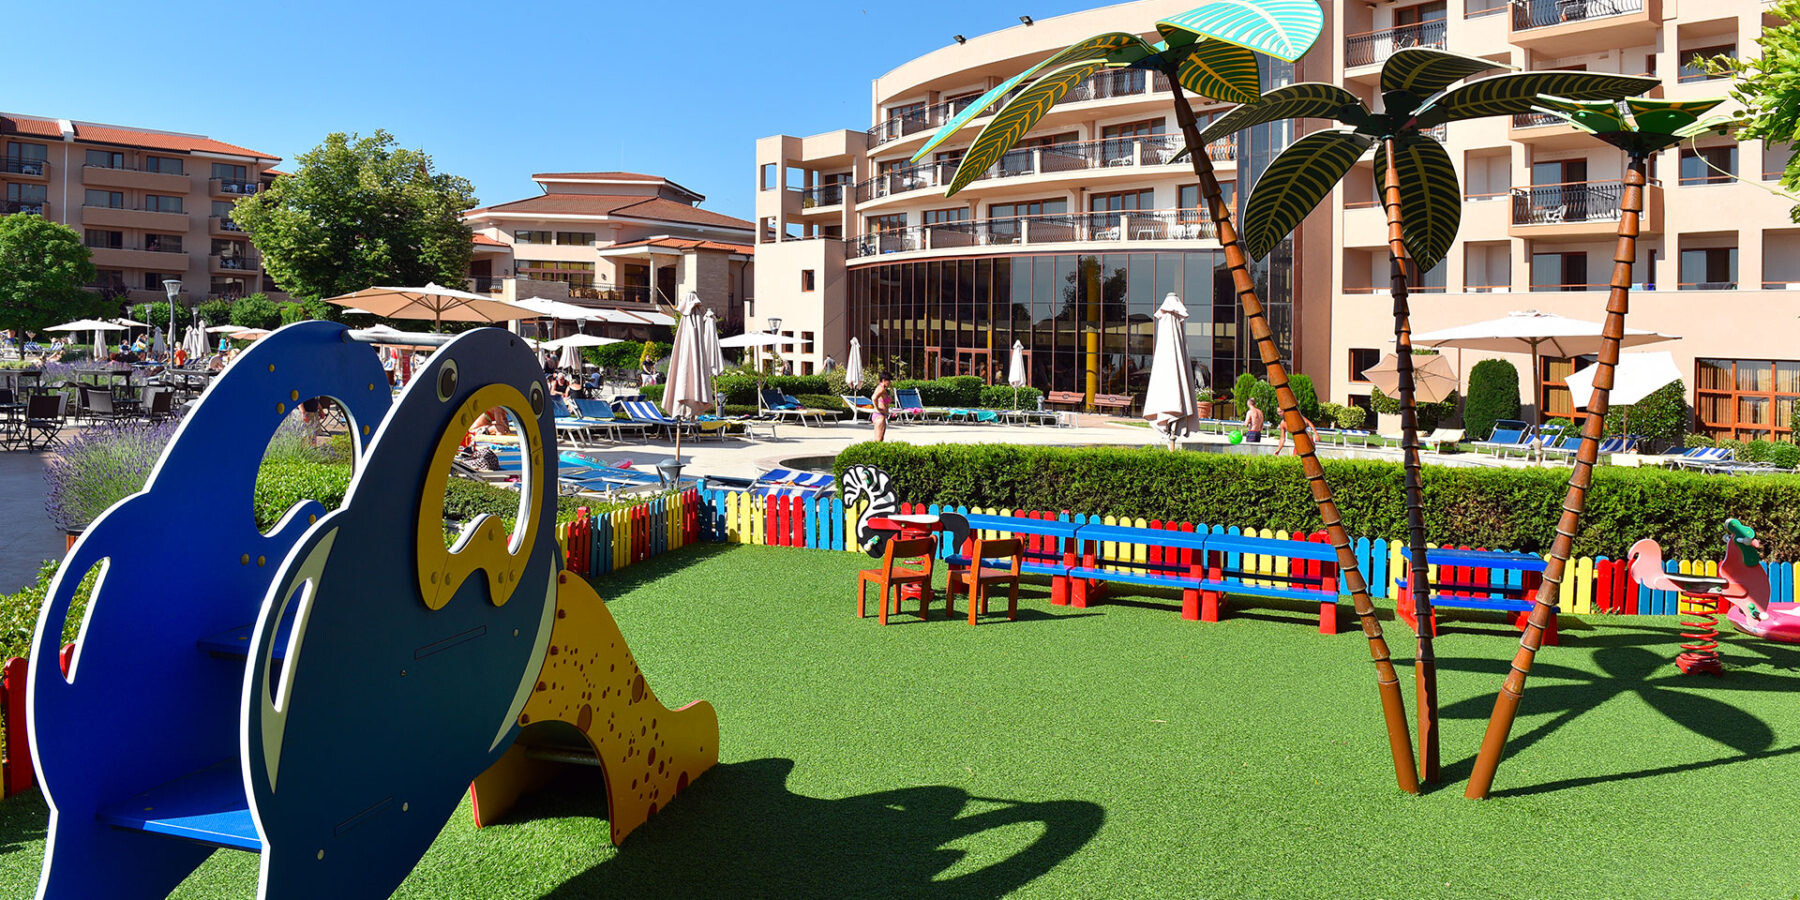 Хотел Мирамар 4* - площадка